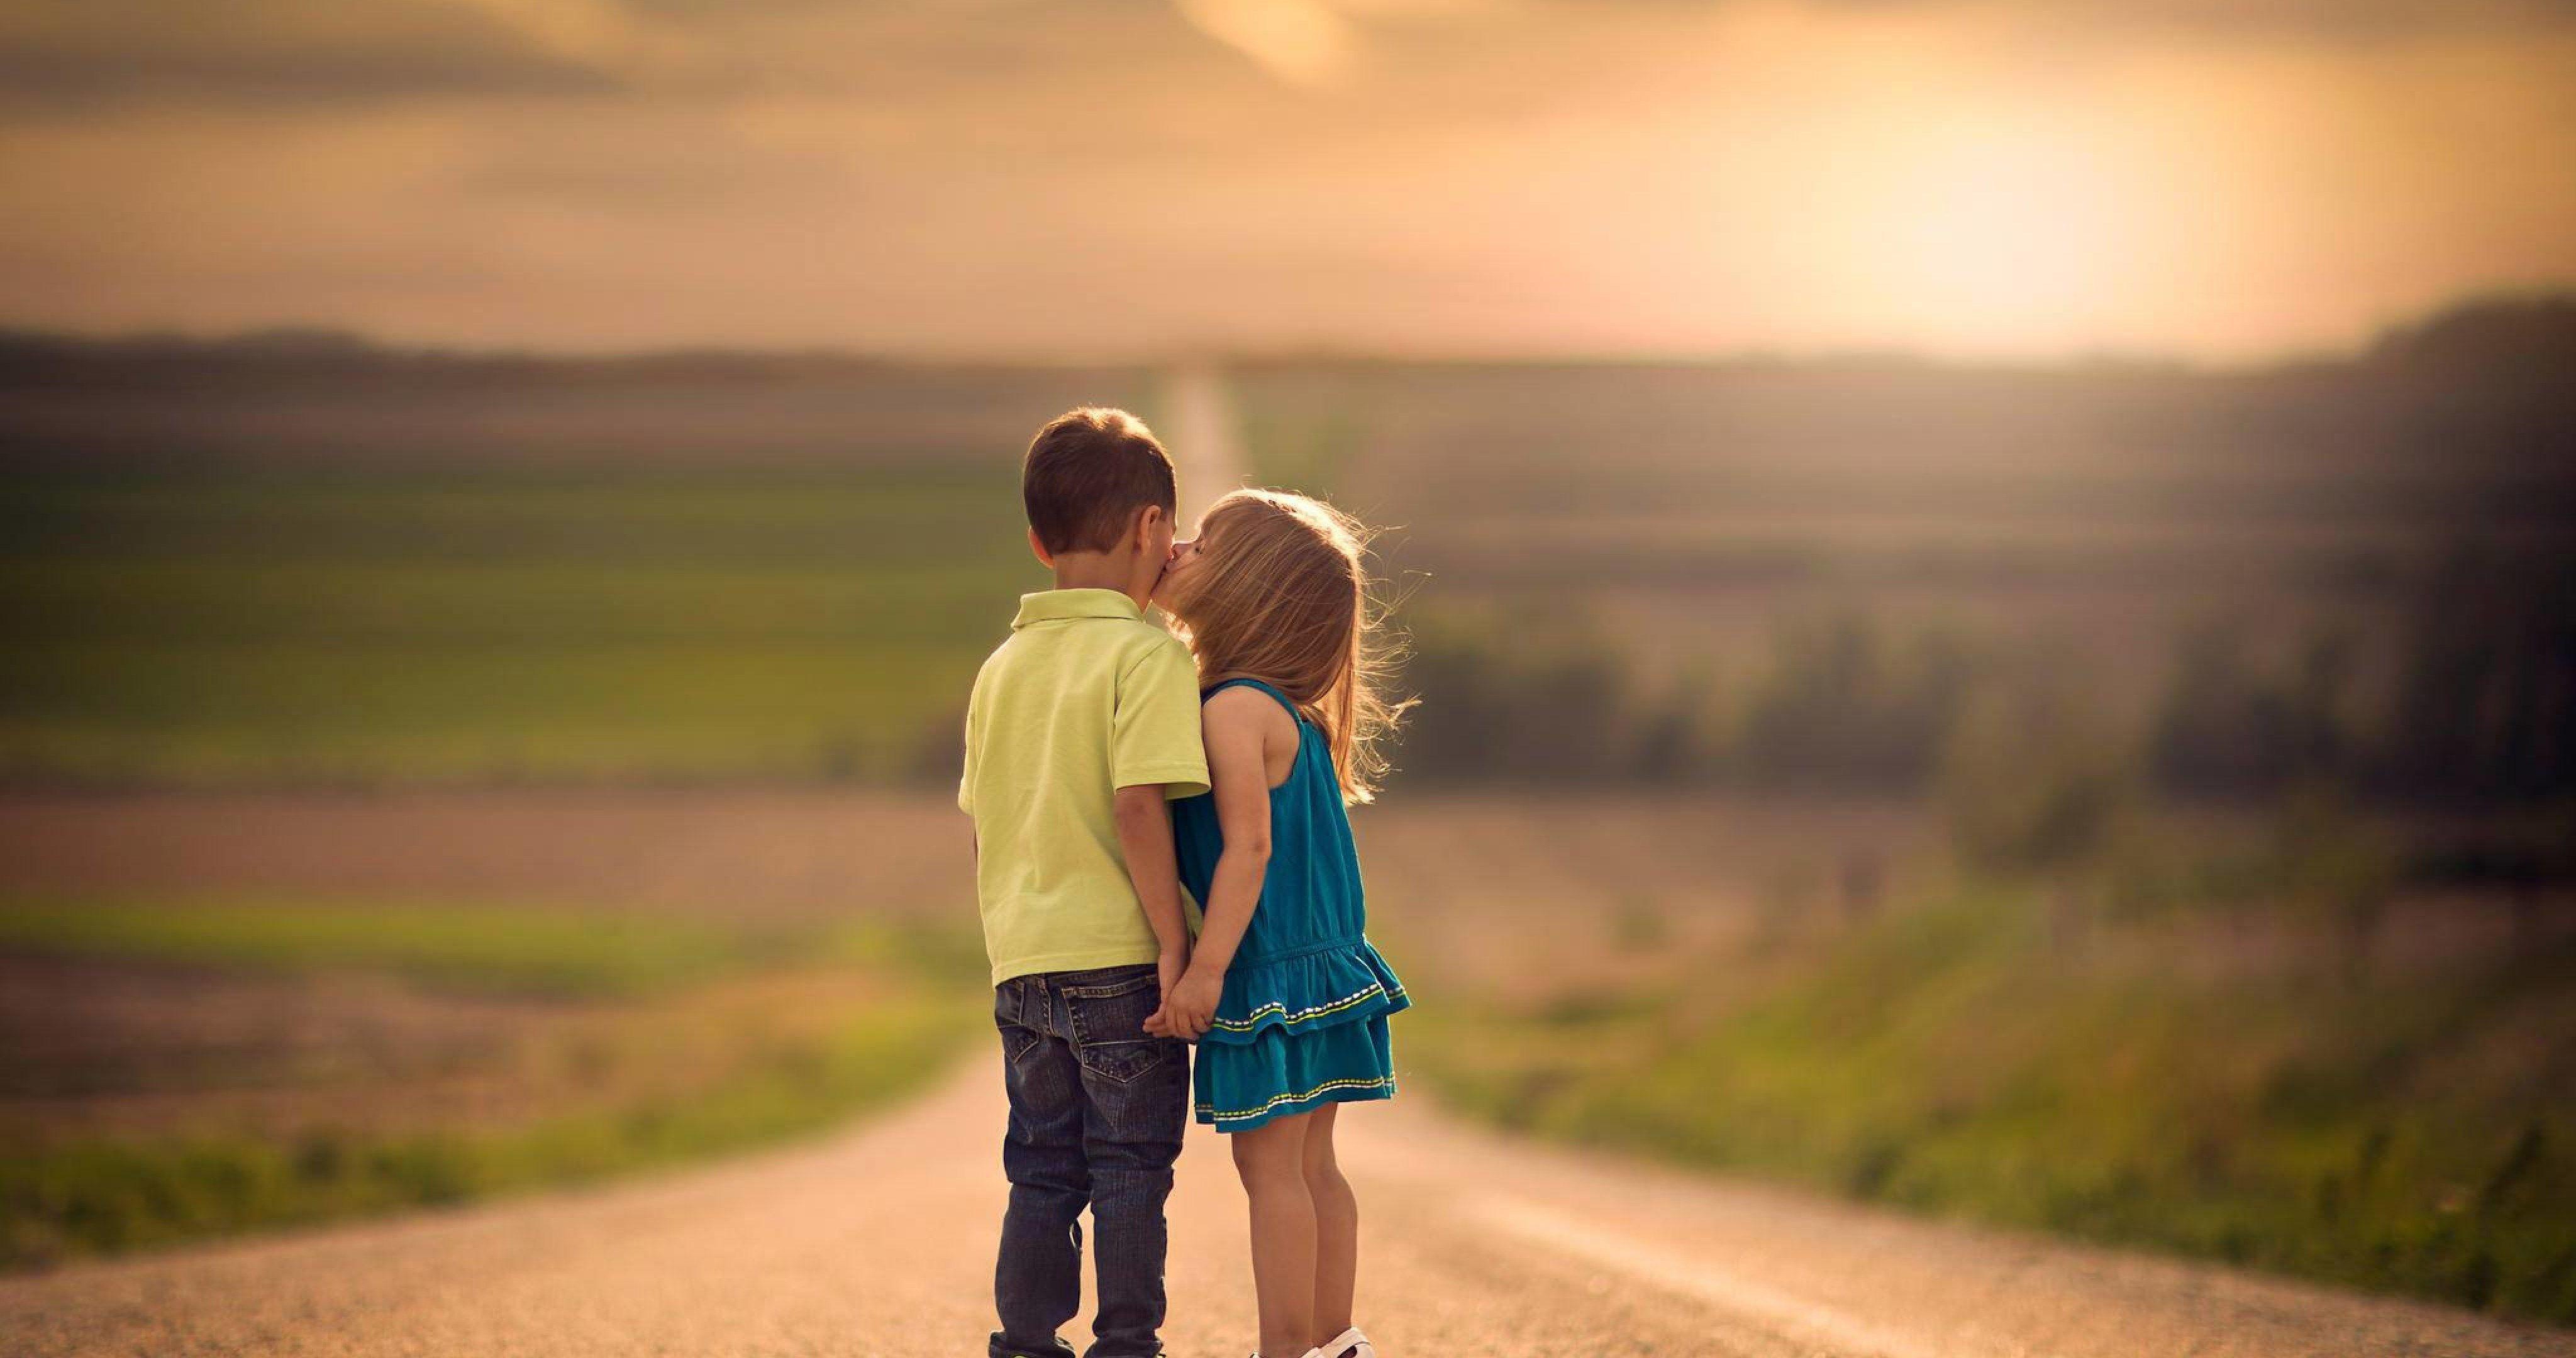 Kids kiss on road 4k ultra hd wallpaper ololoshenka - 4k kiss wallpaper ...